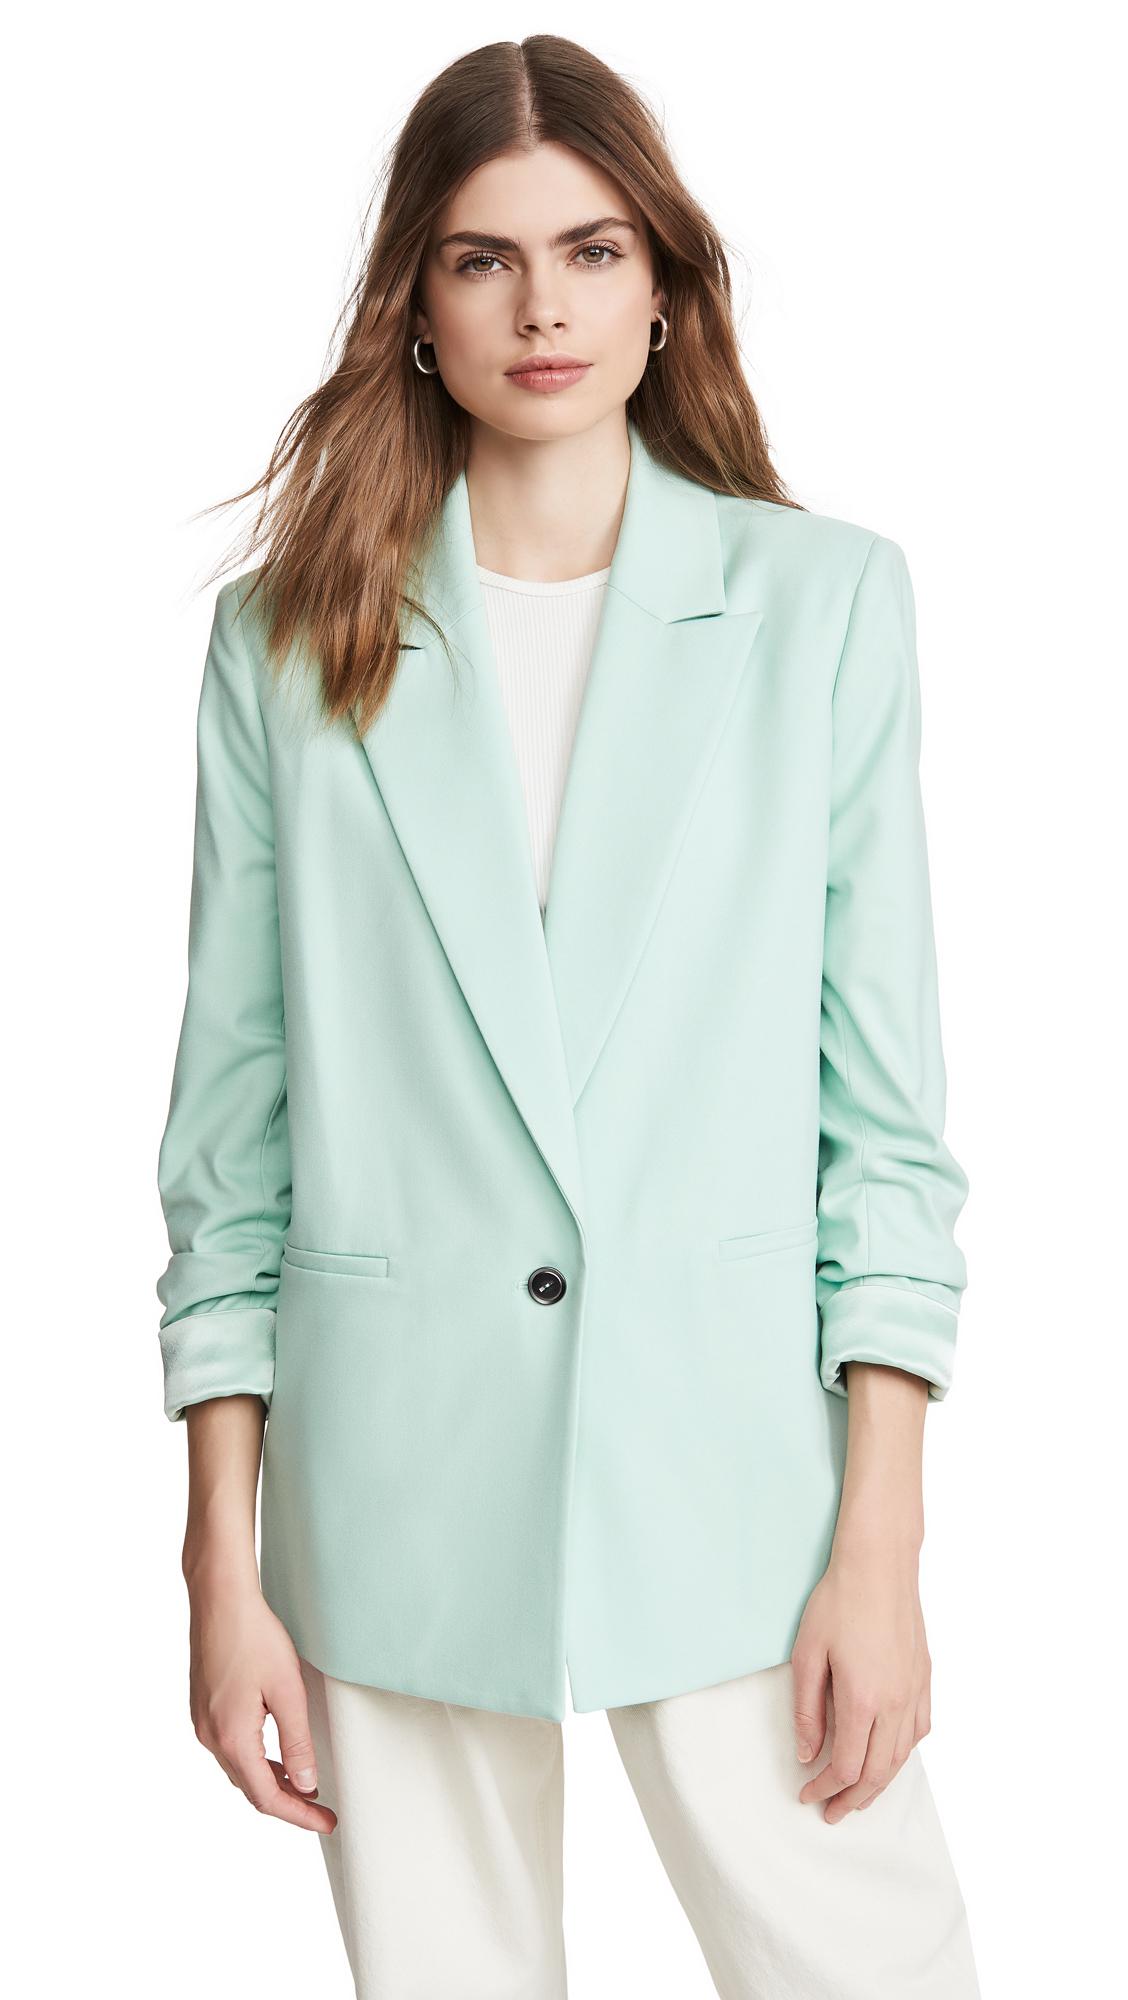 alice + olivia Denny Notch Collar Blazer